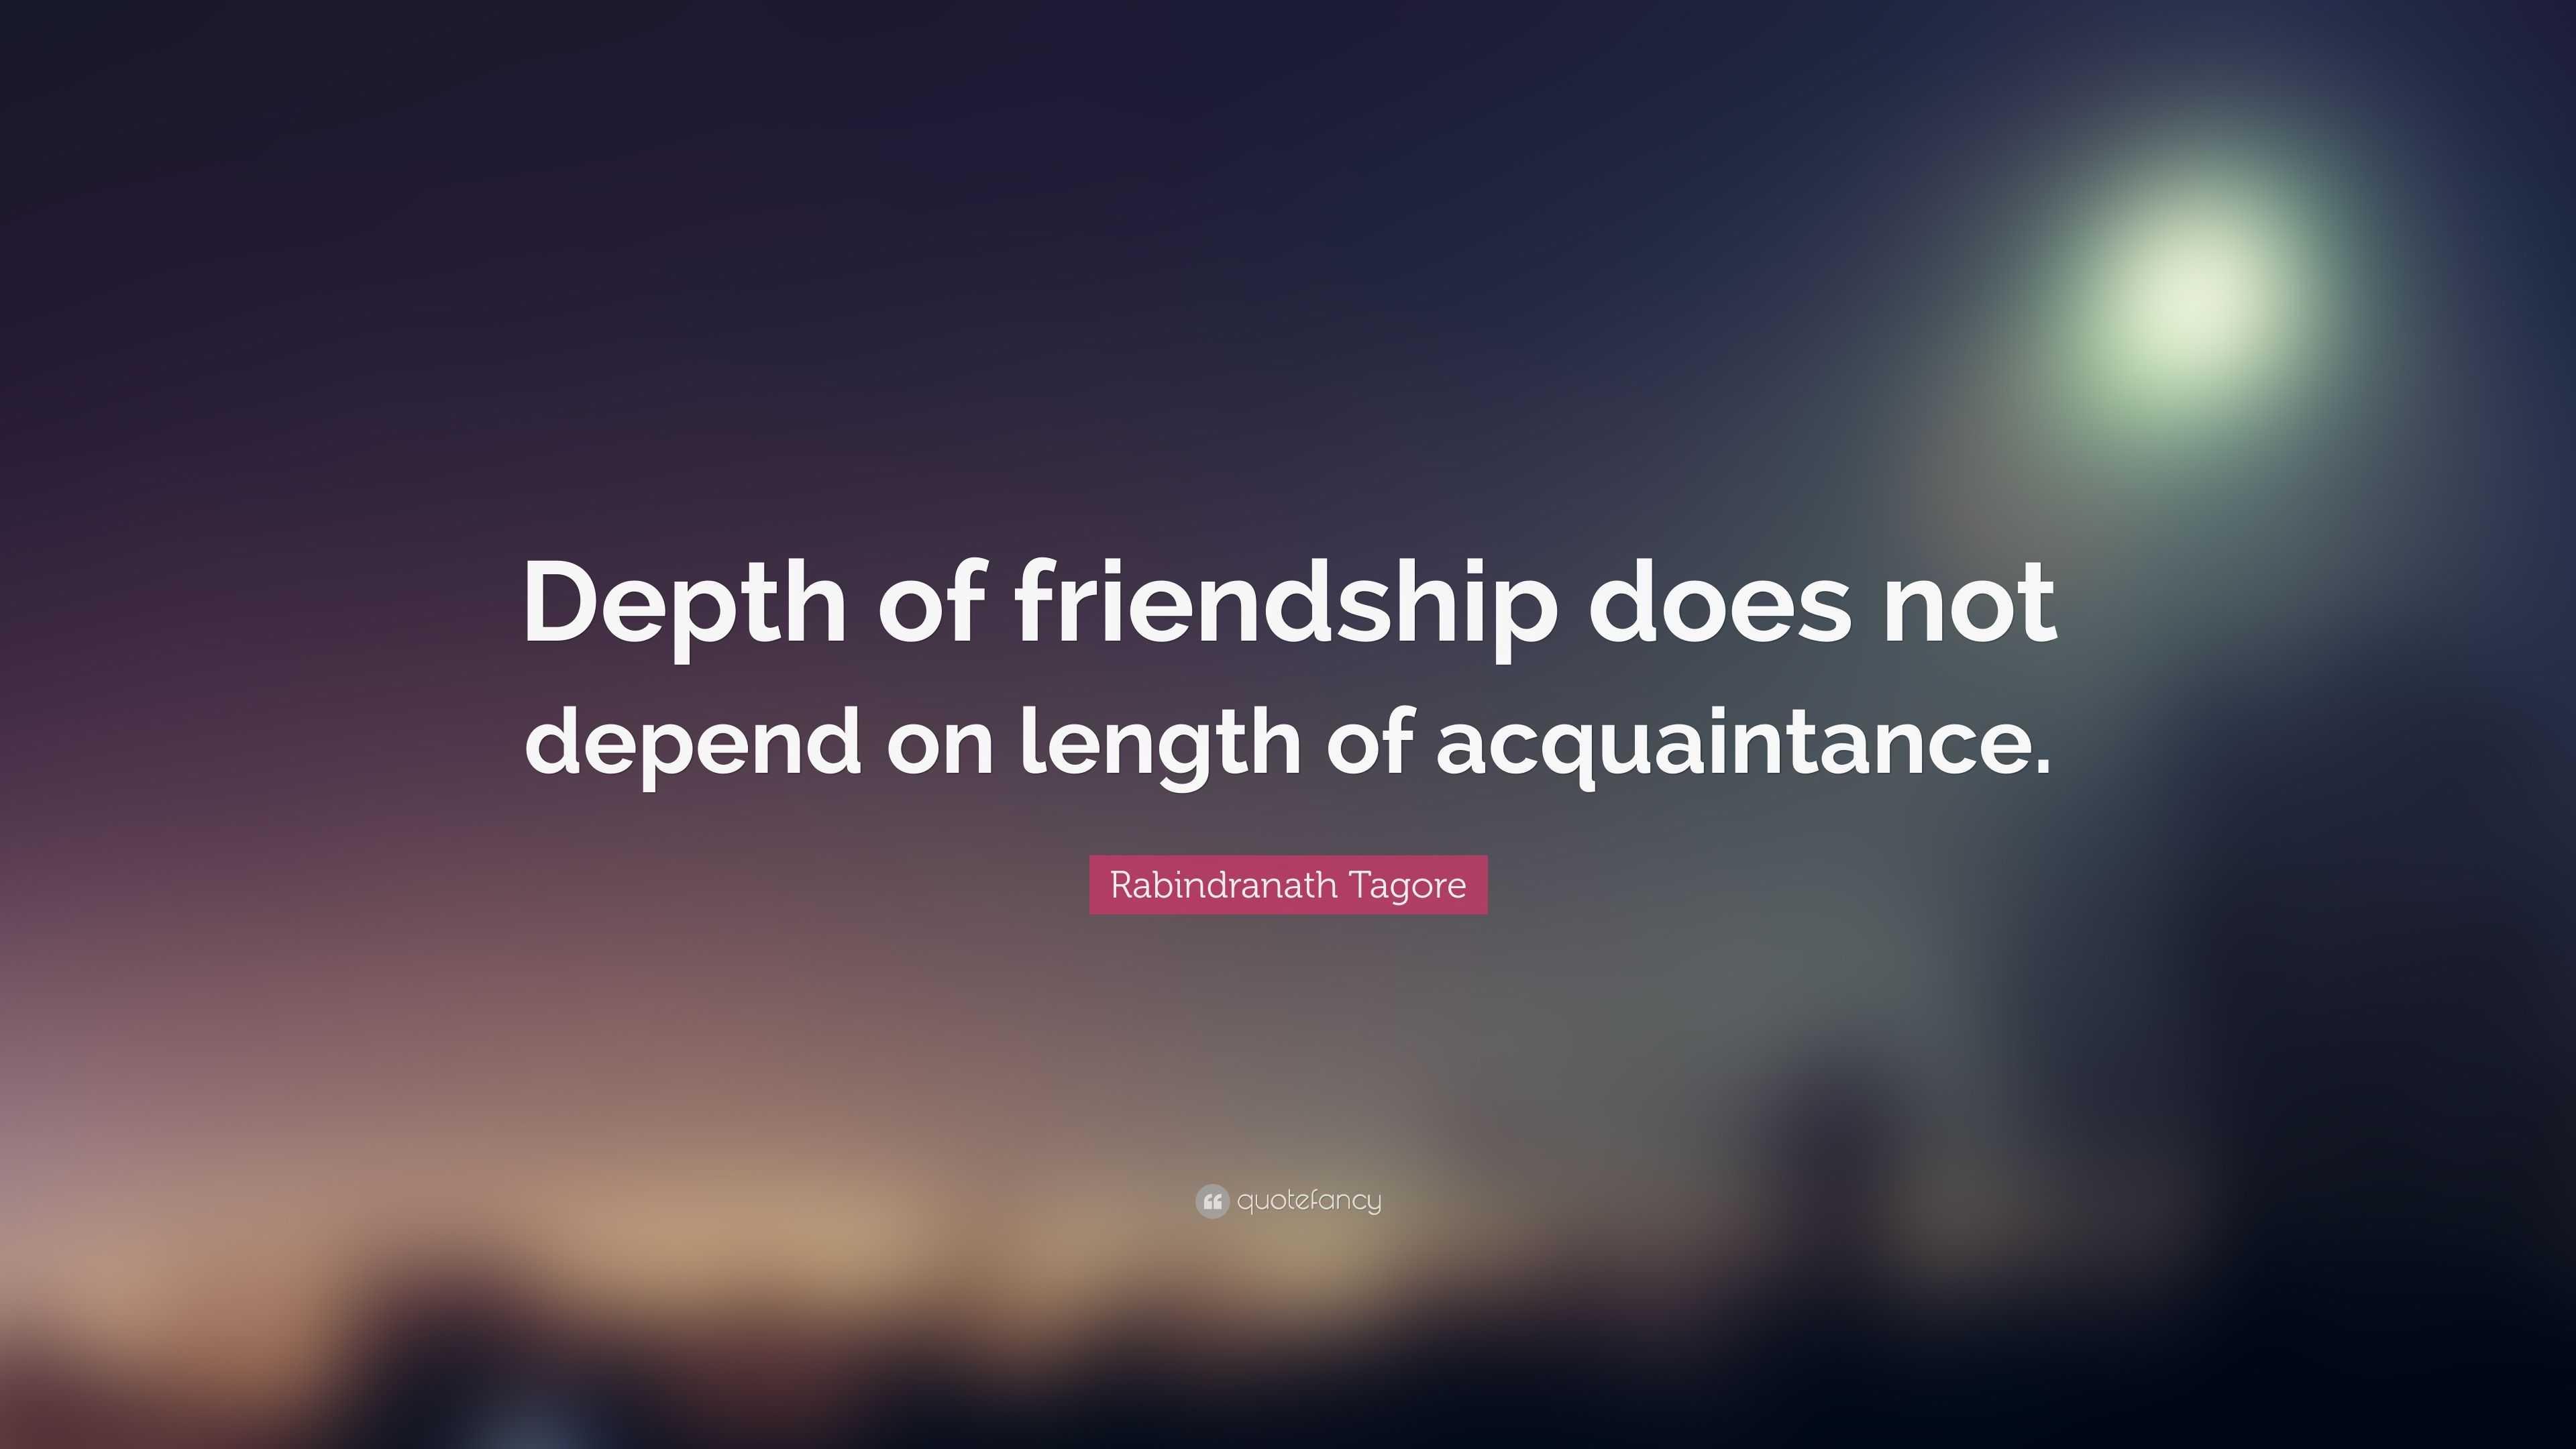 Length of acquaintance